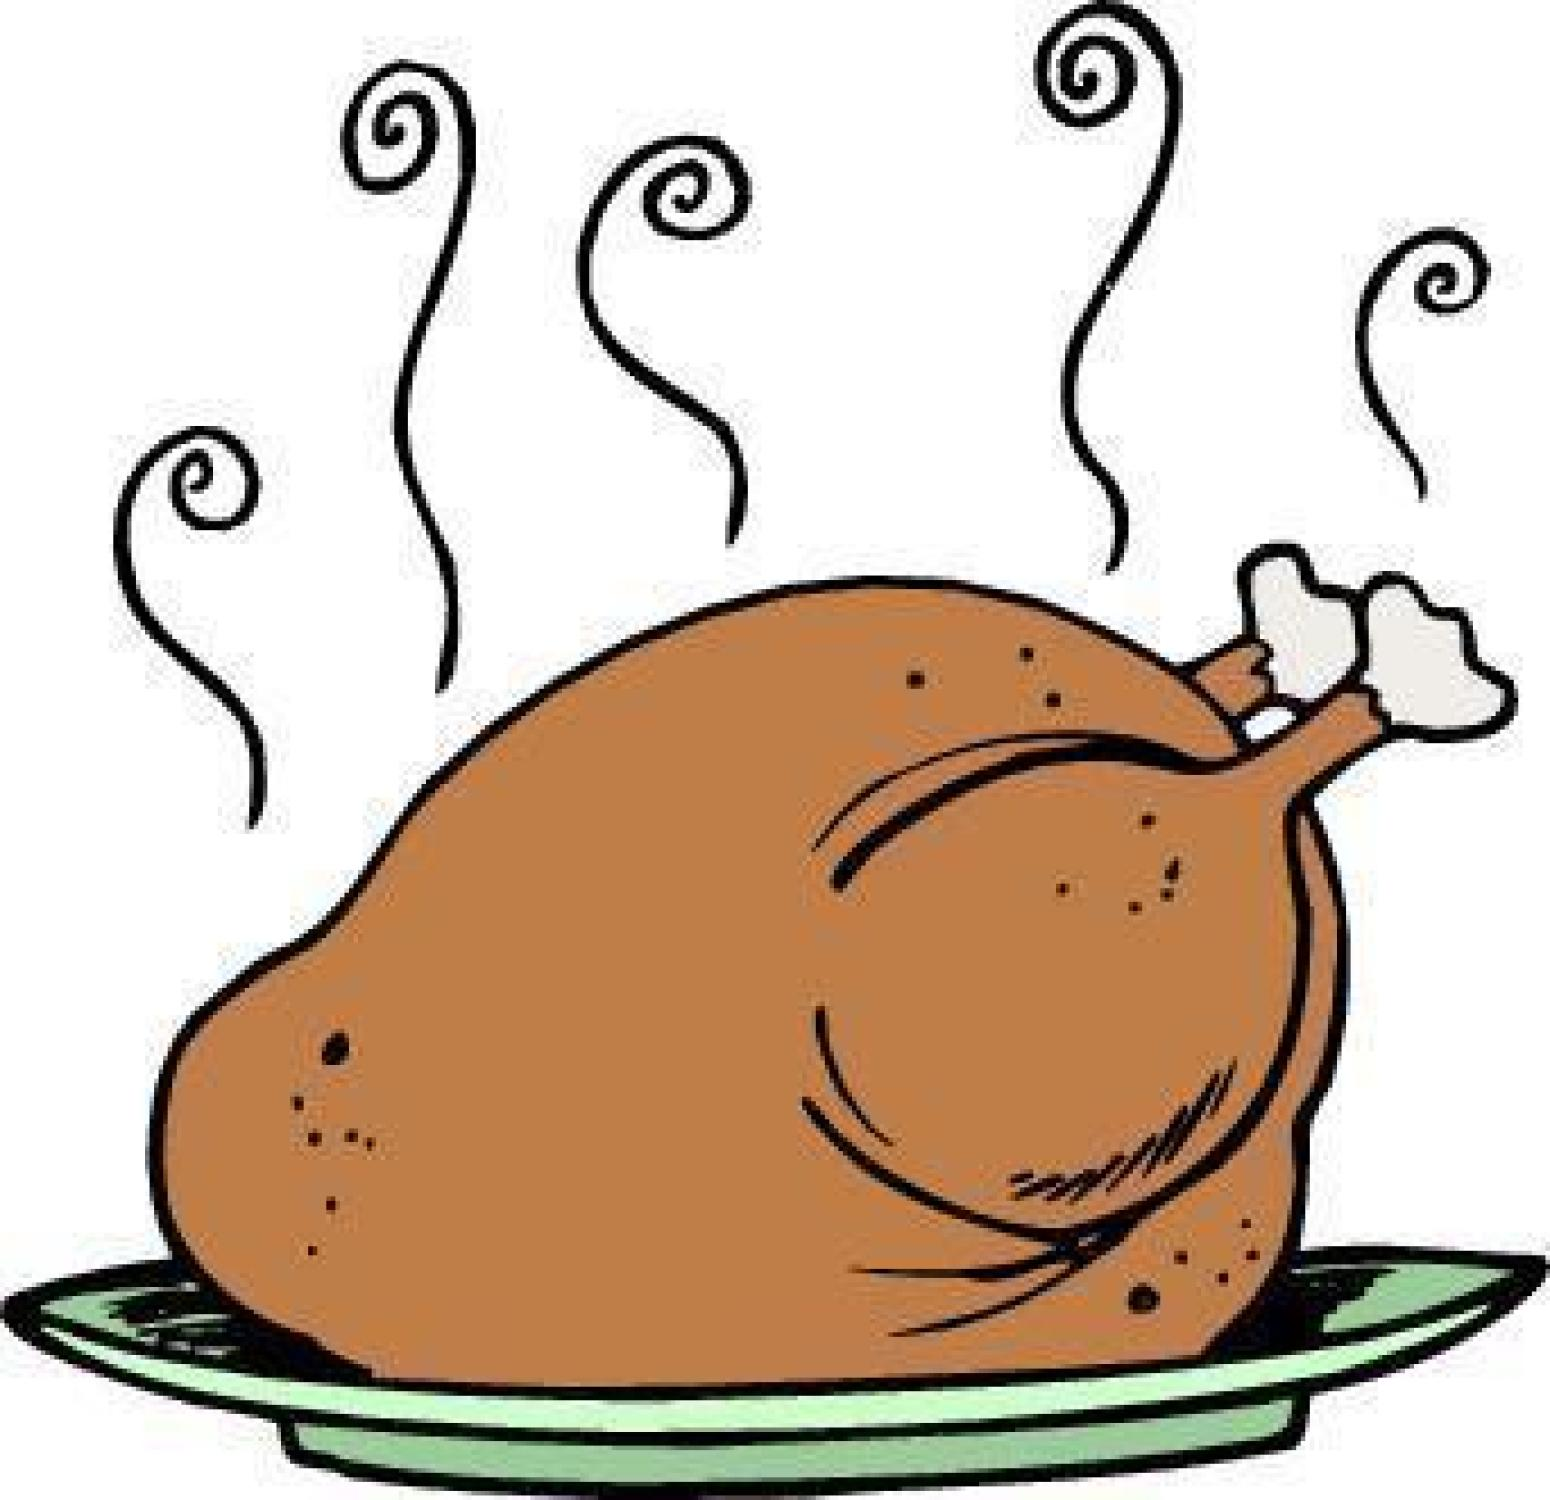 Cooked turkey roasted turkey clipart.